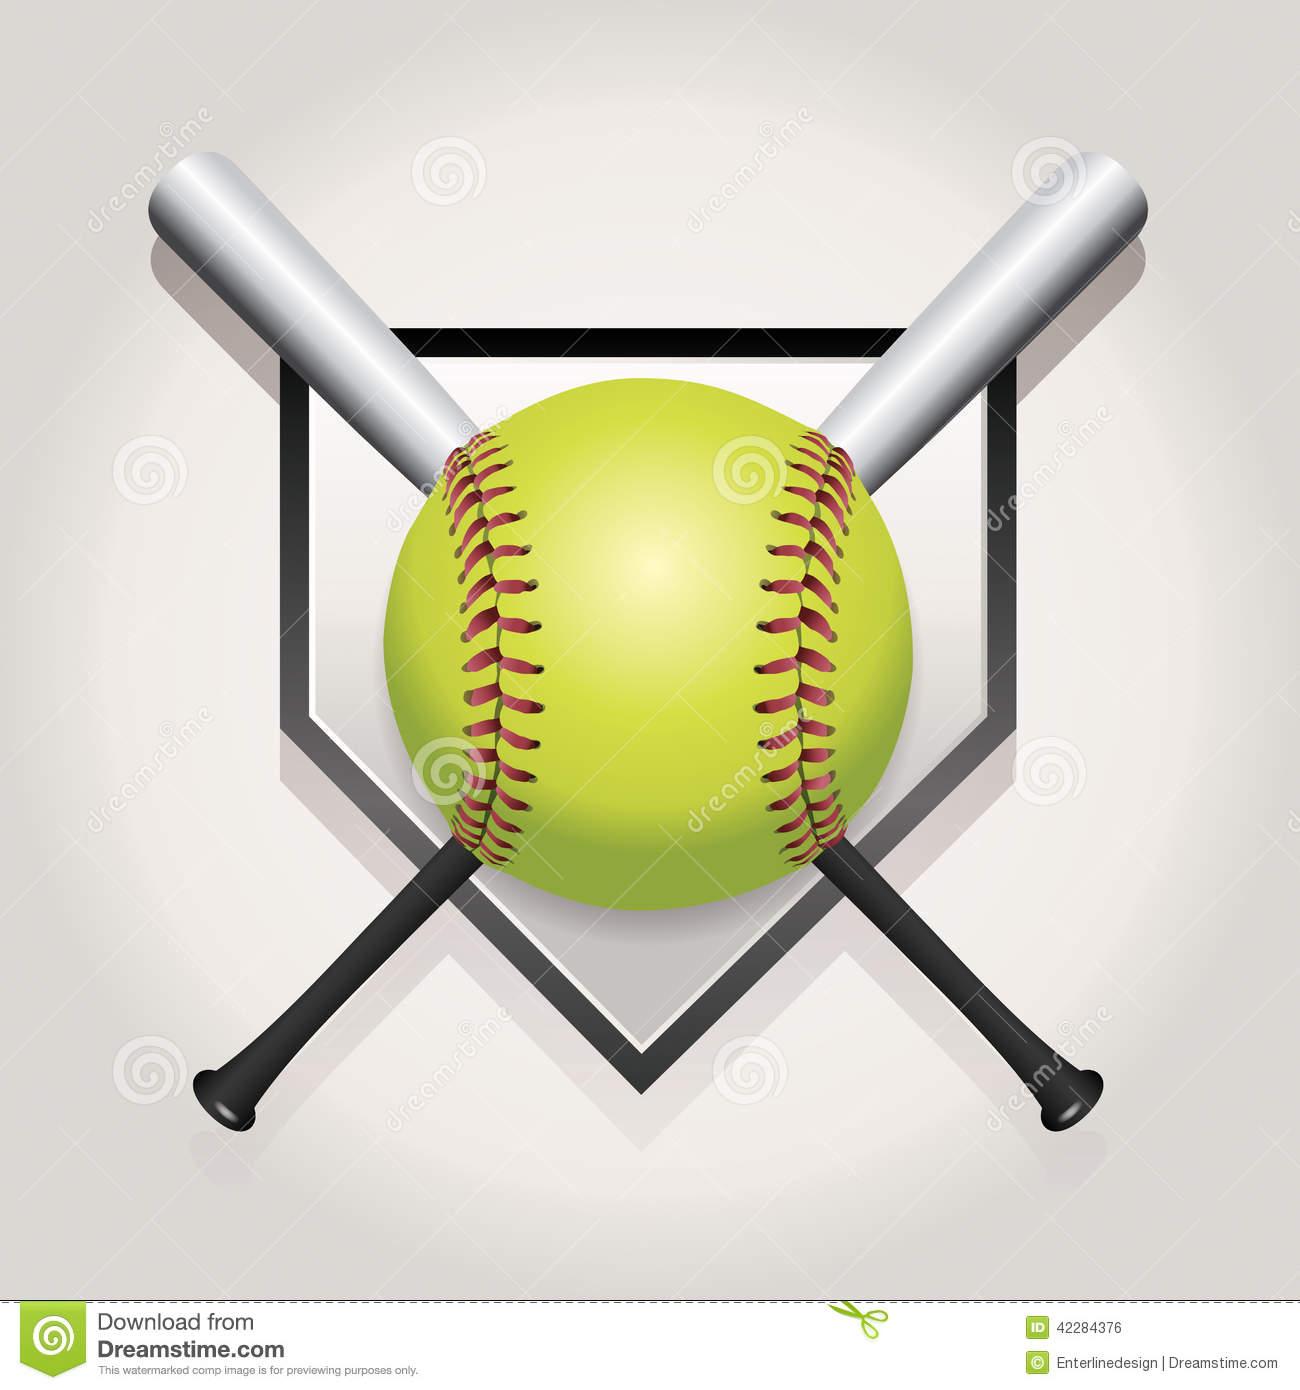 1300x1390 Softball And Bat Clipart Amp Softball And Bat Clip Art Images